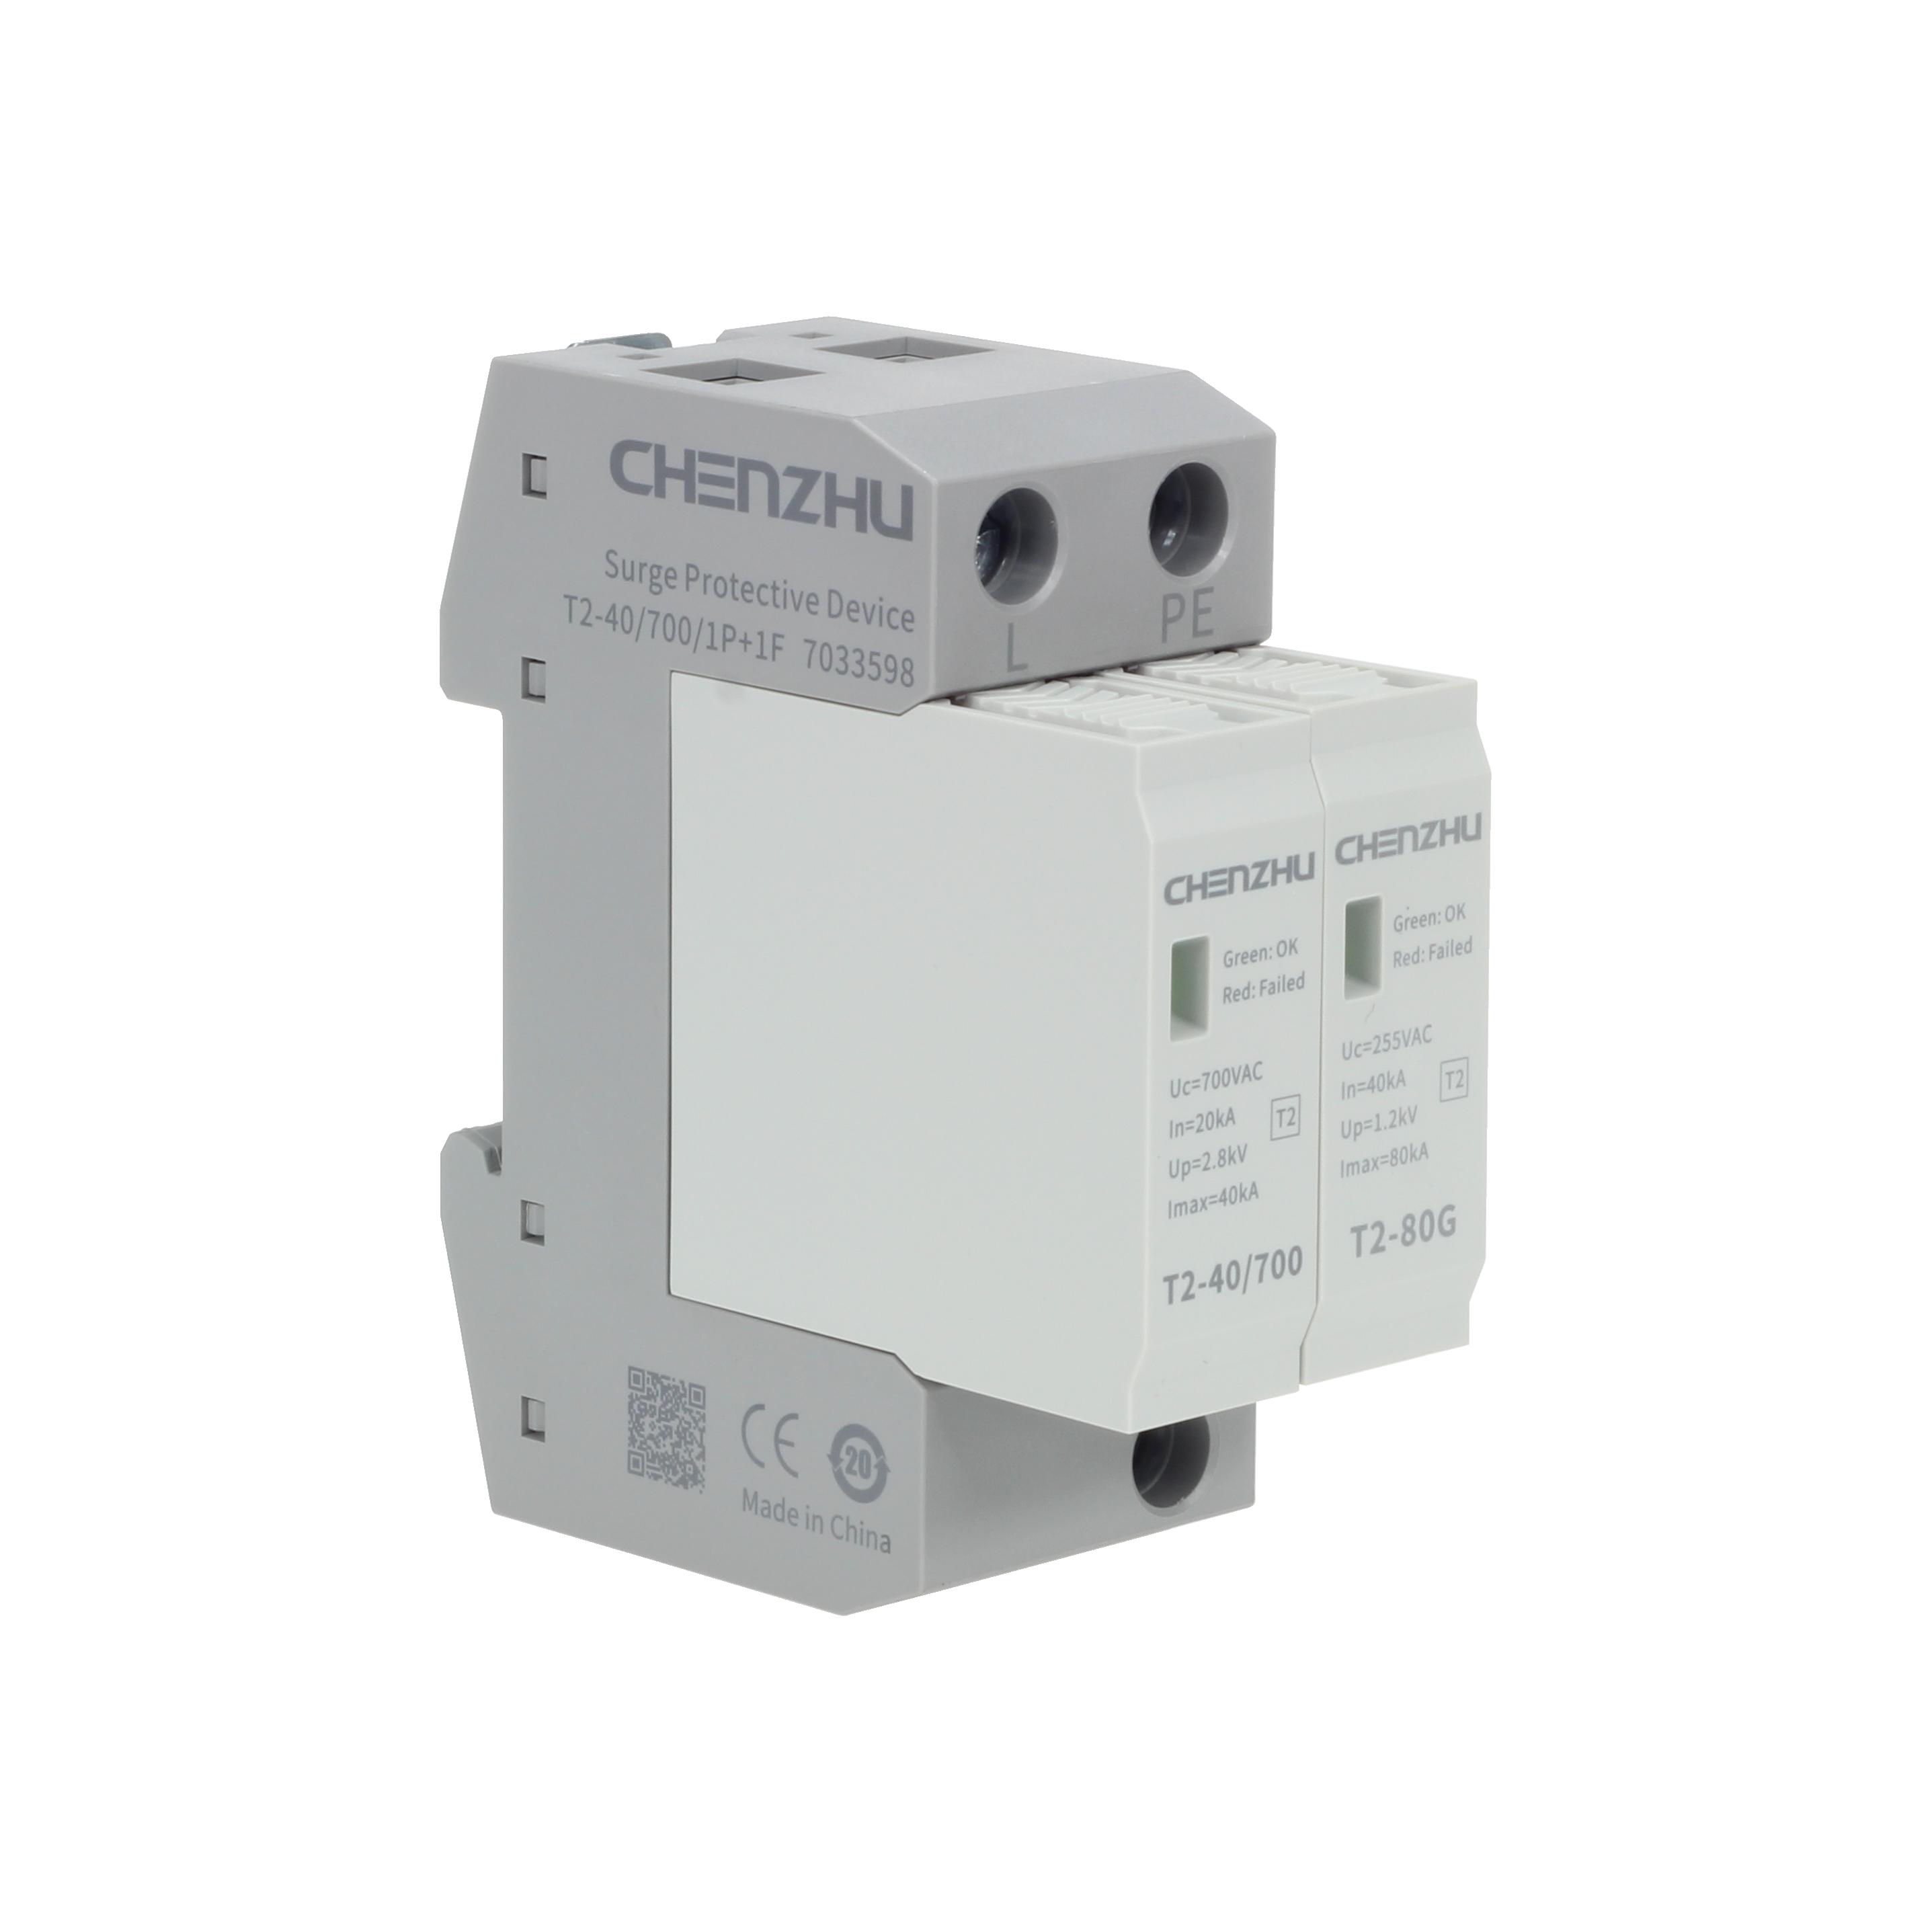 AC Power SPD (400/690VAC; Single phase TT; In=20kA; alarm output ) 7078124